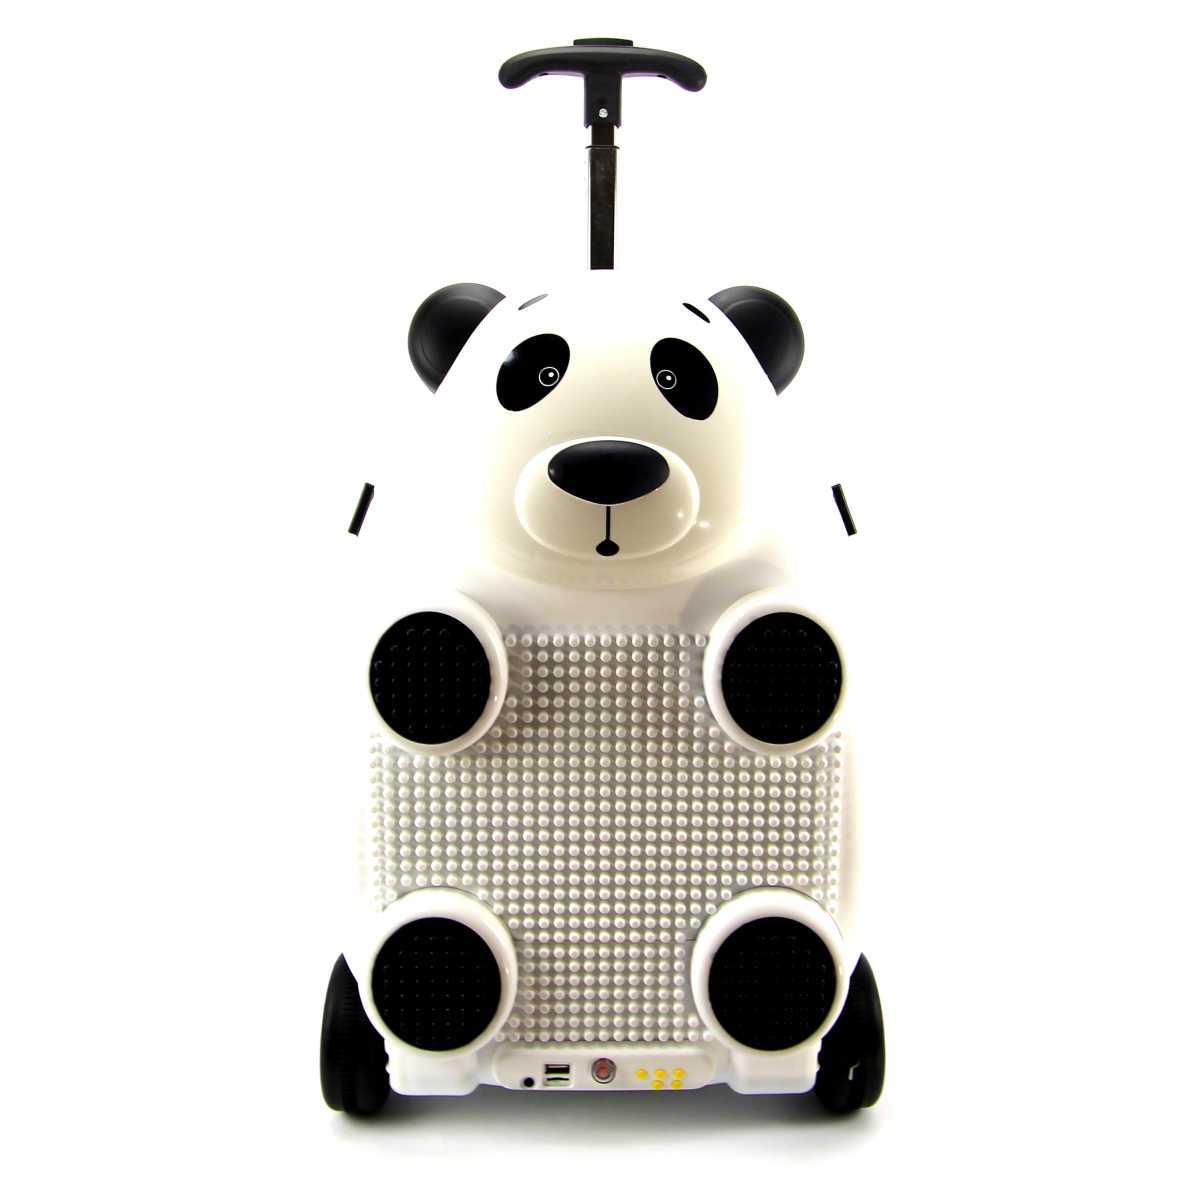 Malinha Infantil Controle Remoto Panda Sestini Play 065483-63